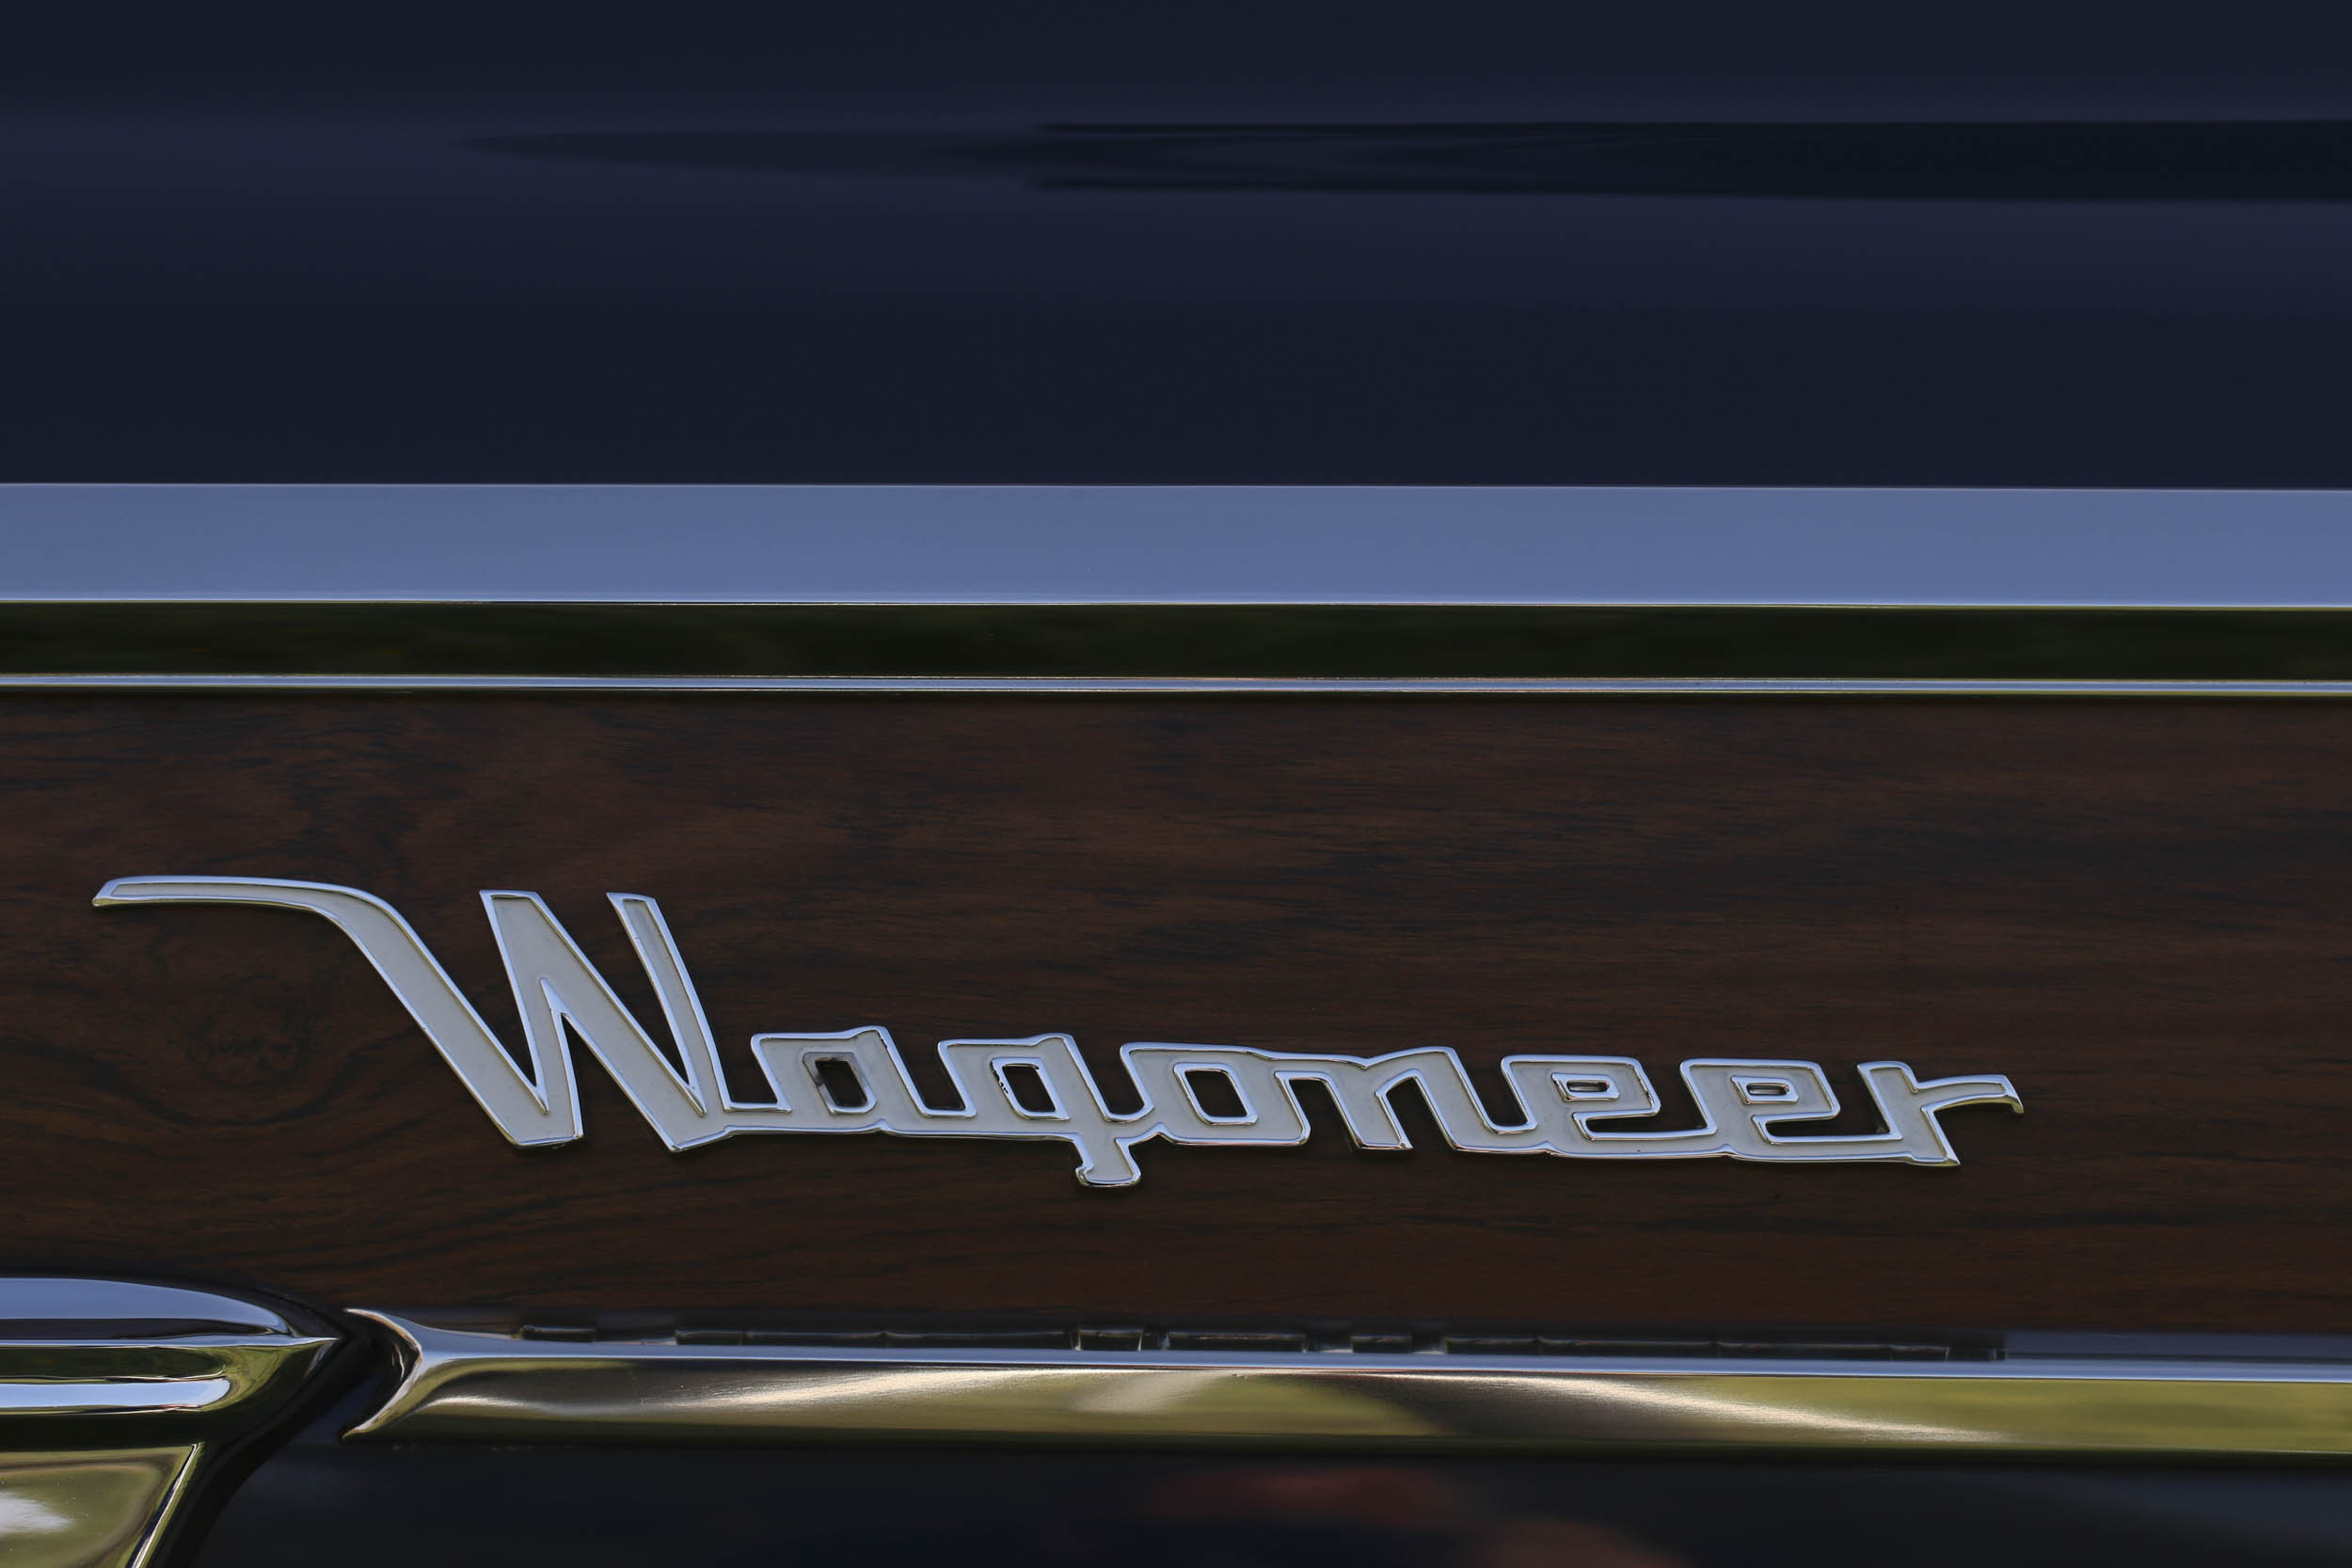 ICON Wagoneer badge